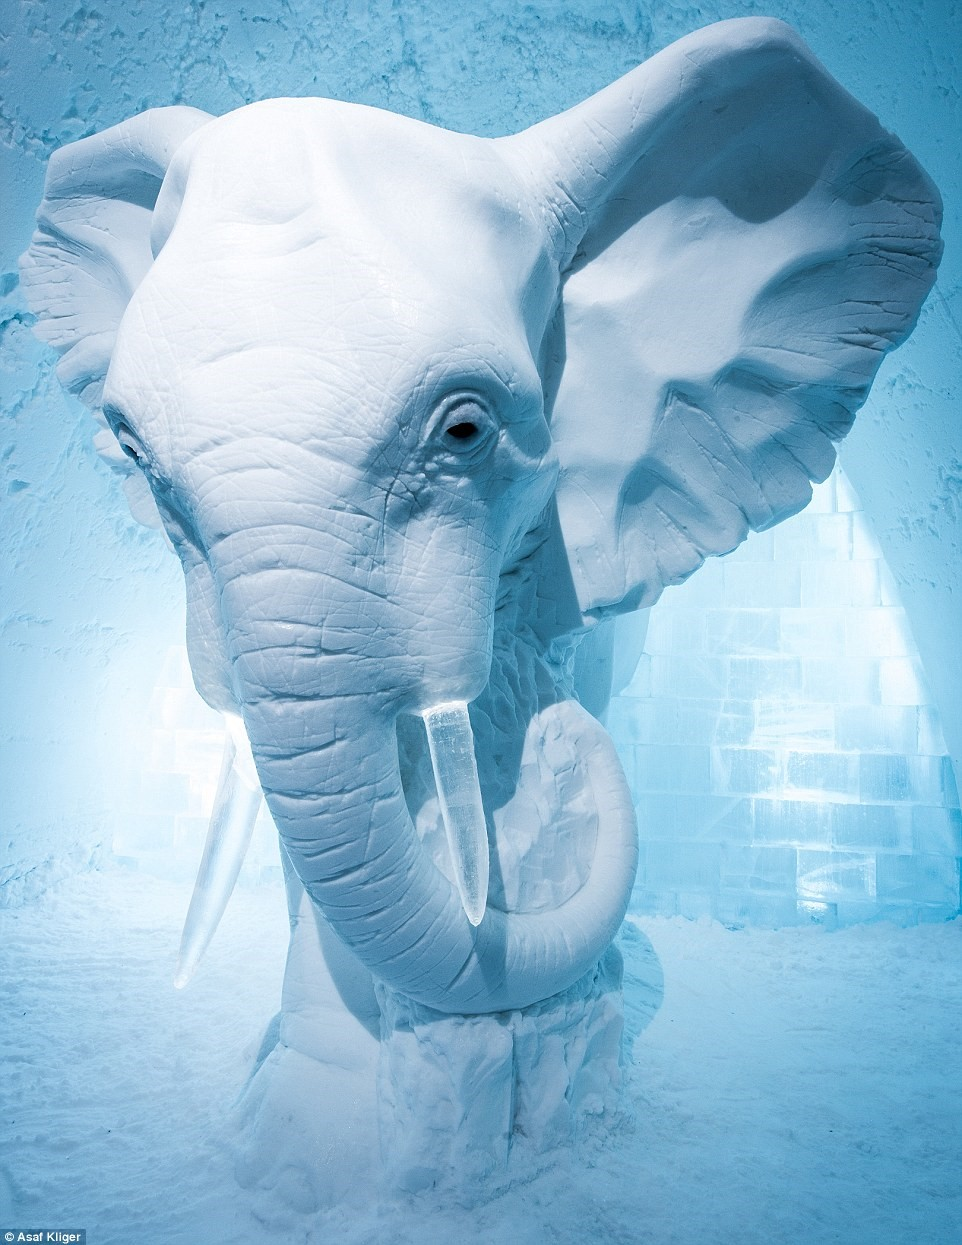 icehotel sweden ice hotel 365 sweden icehotel 365 icehotel365 ice hotel sweden facts (1)